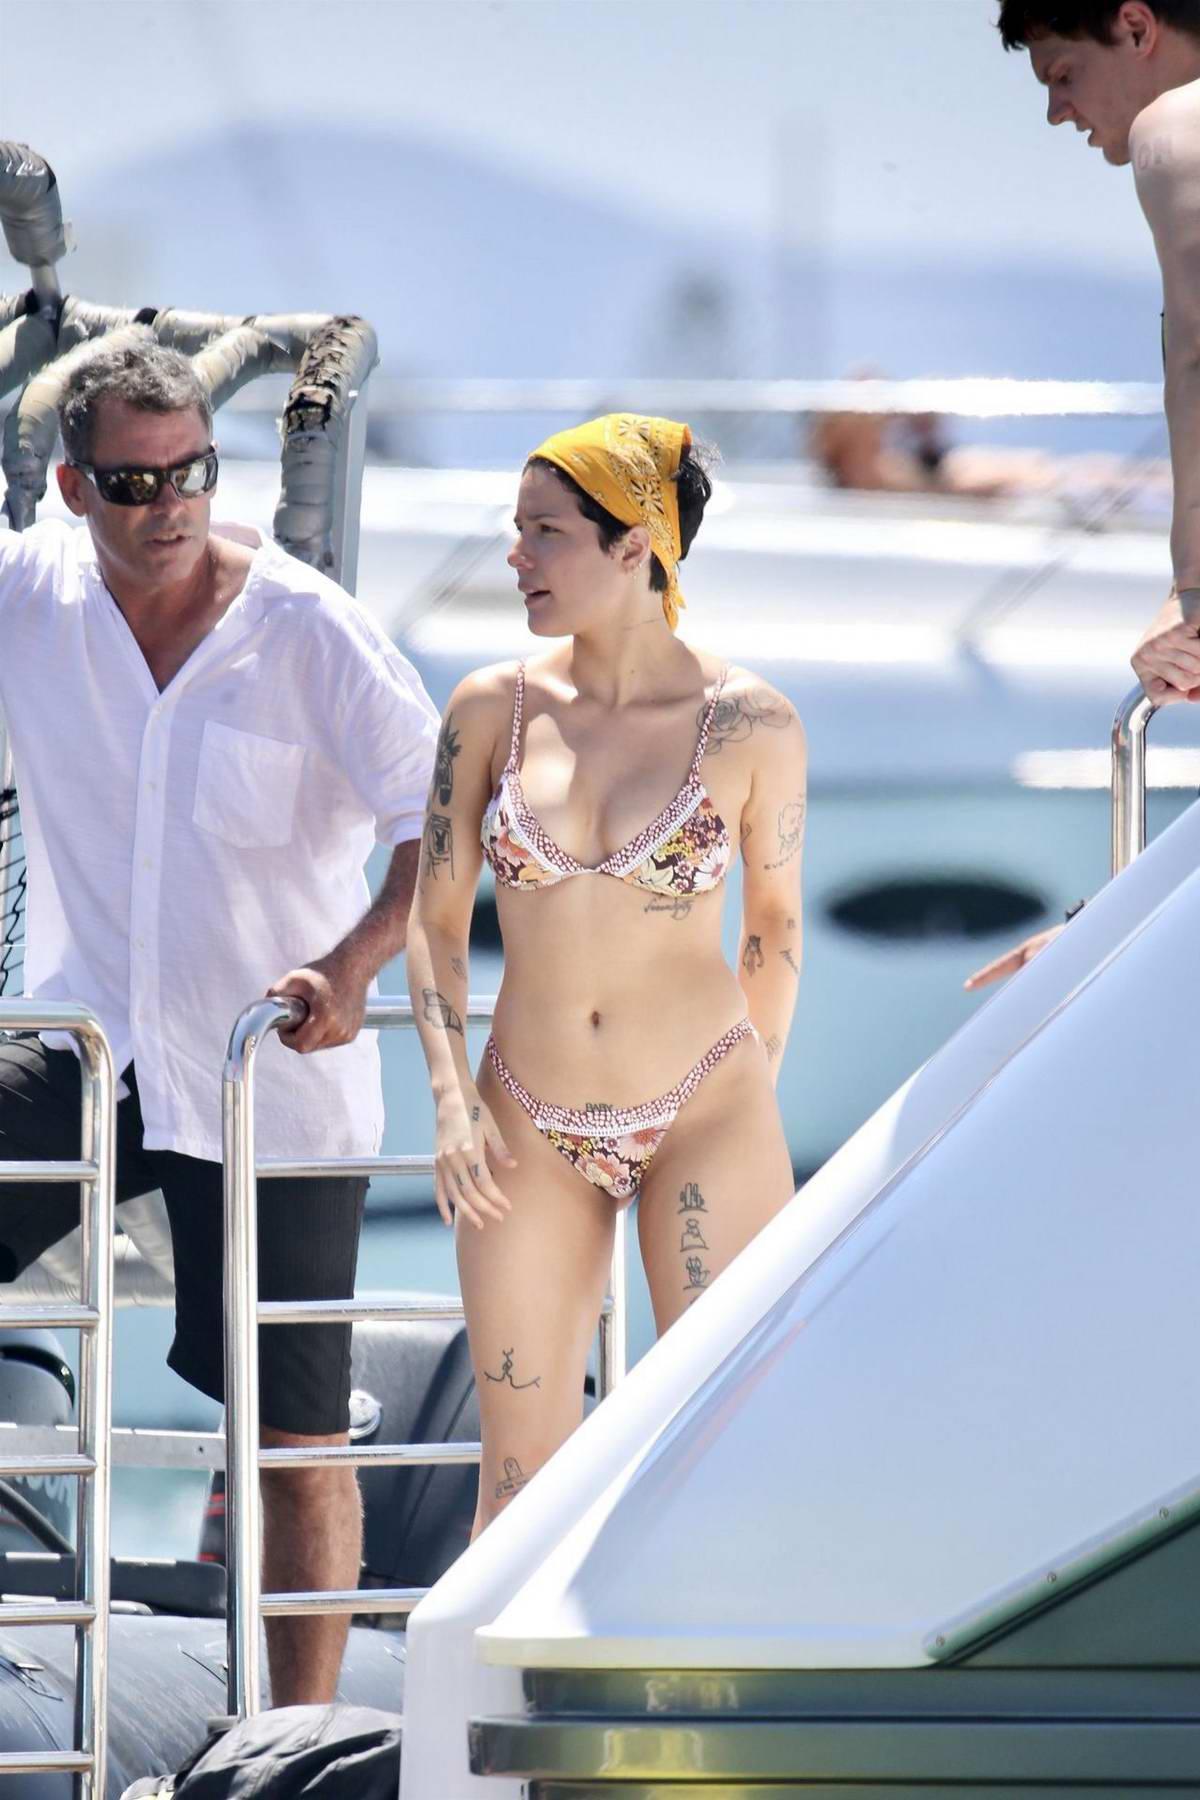 Halsey wears a floral print bikini while enjoying the sunny Gold Coast on Jet ski in Australia